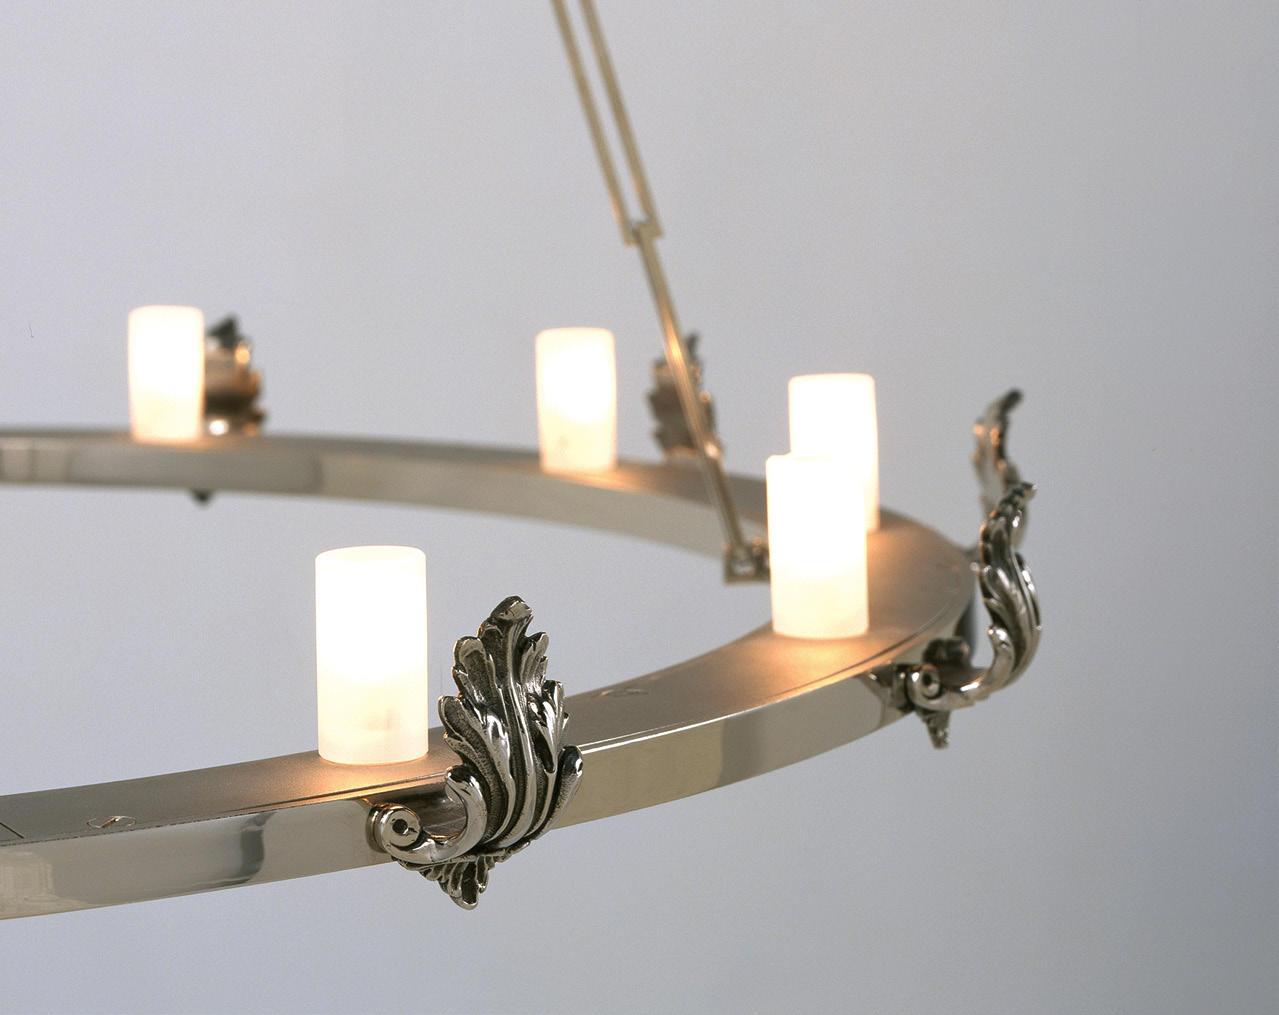 jonathan browning lighting. Vicomte Chandelier By Jonathan Browning Studios | Ceiling Suspended Chandeliers Lighting